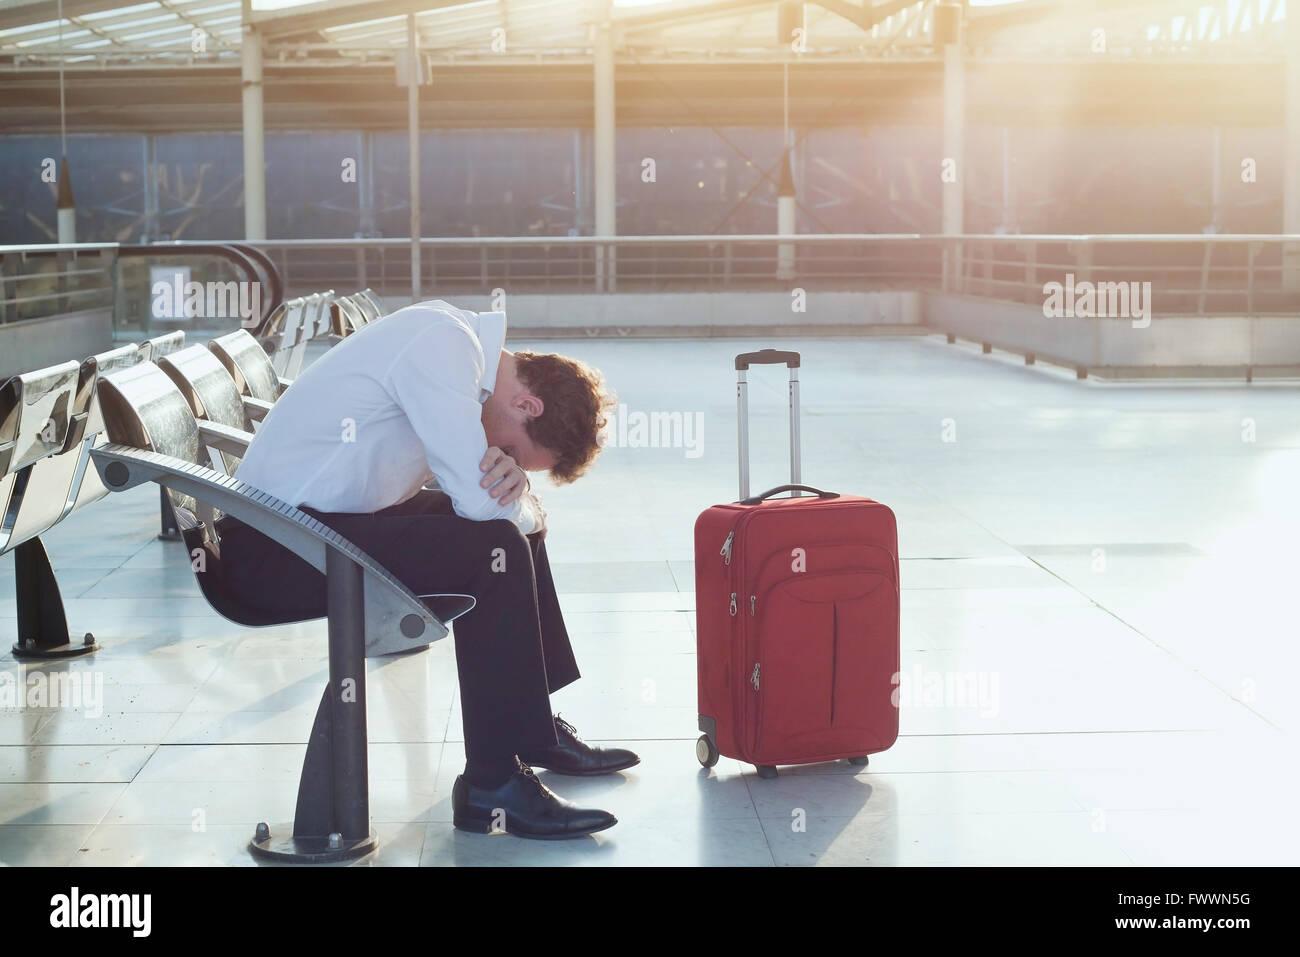 Problem mit dem Transport, Verspätung des Fluges, deprimiert Pendler mit seinem Gepäck Stockfoto